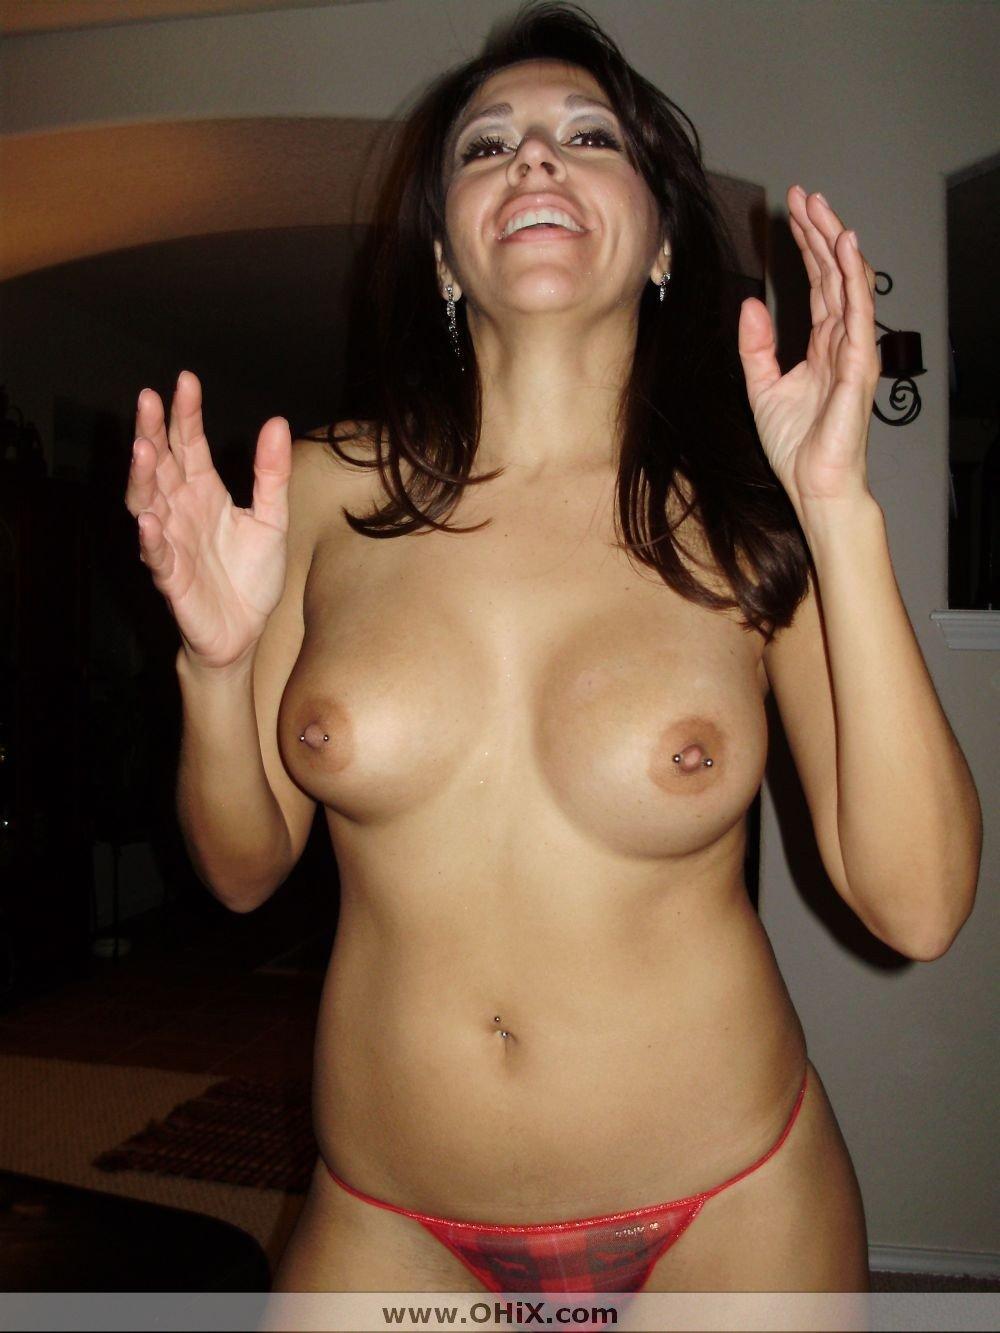 http://static.ohix.com/photos/Mature-brune-bronzee-4/23.jpg